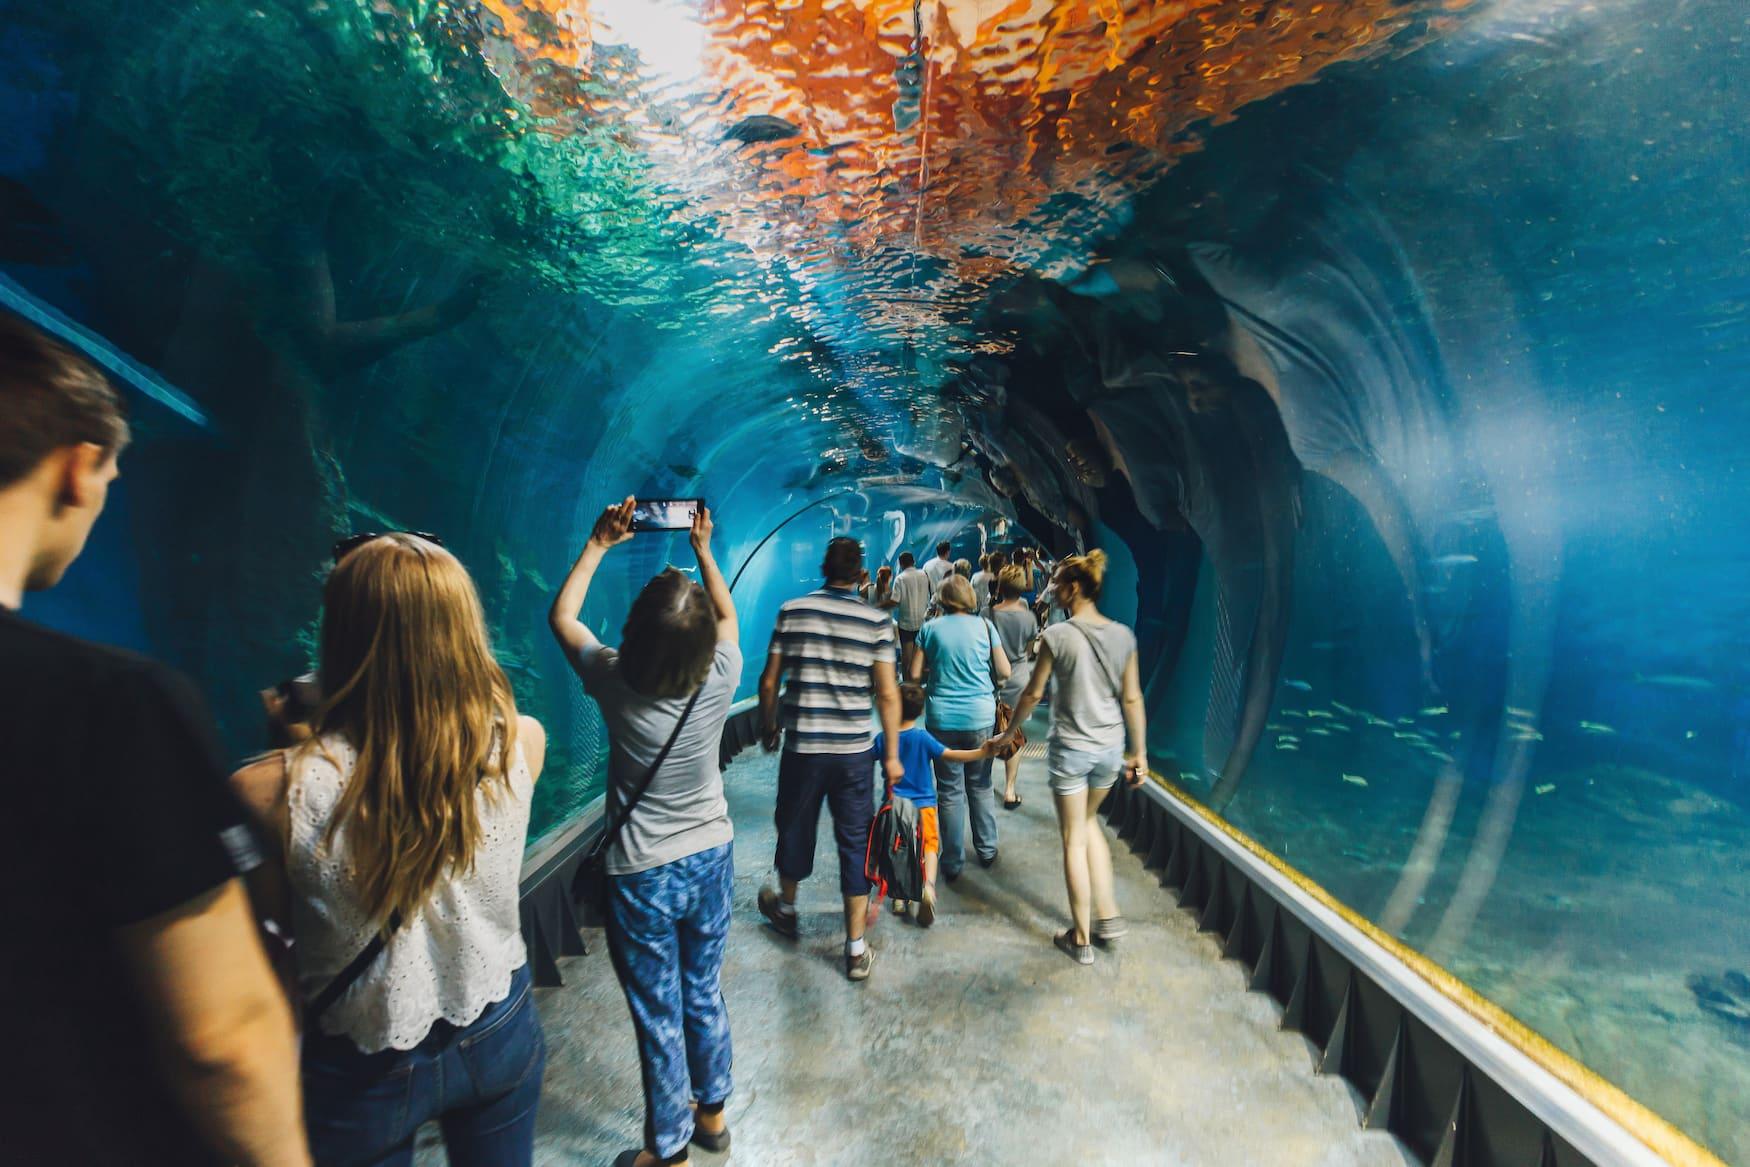 Zoobesucher in modernem Tunnel in Aquarium